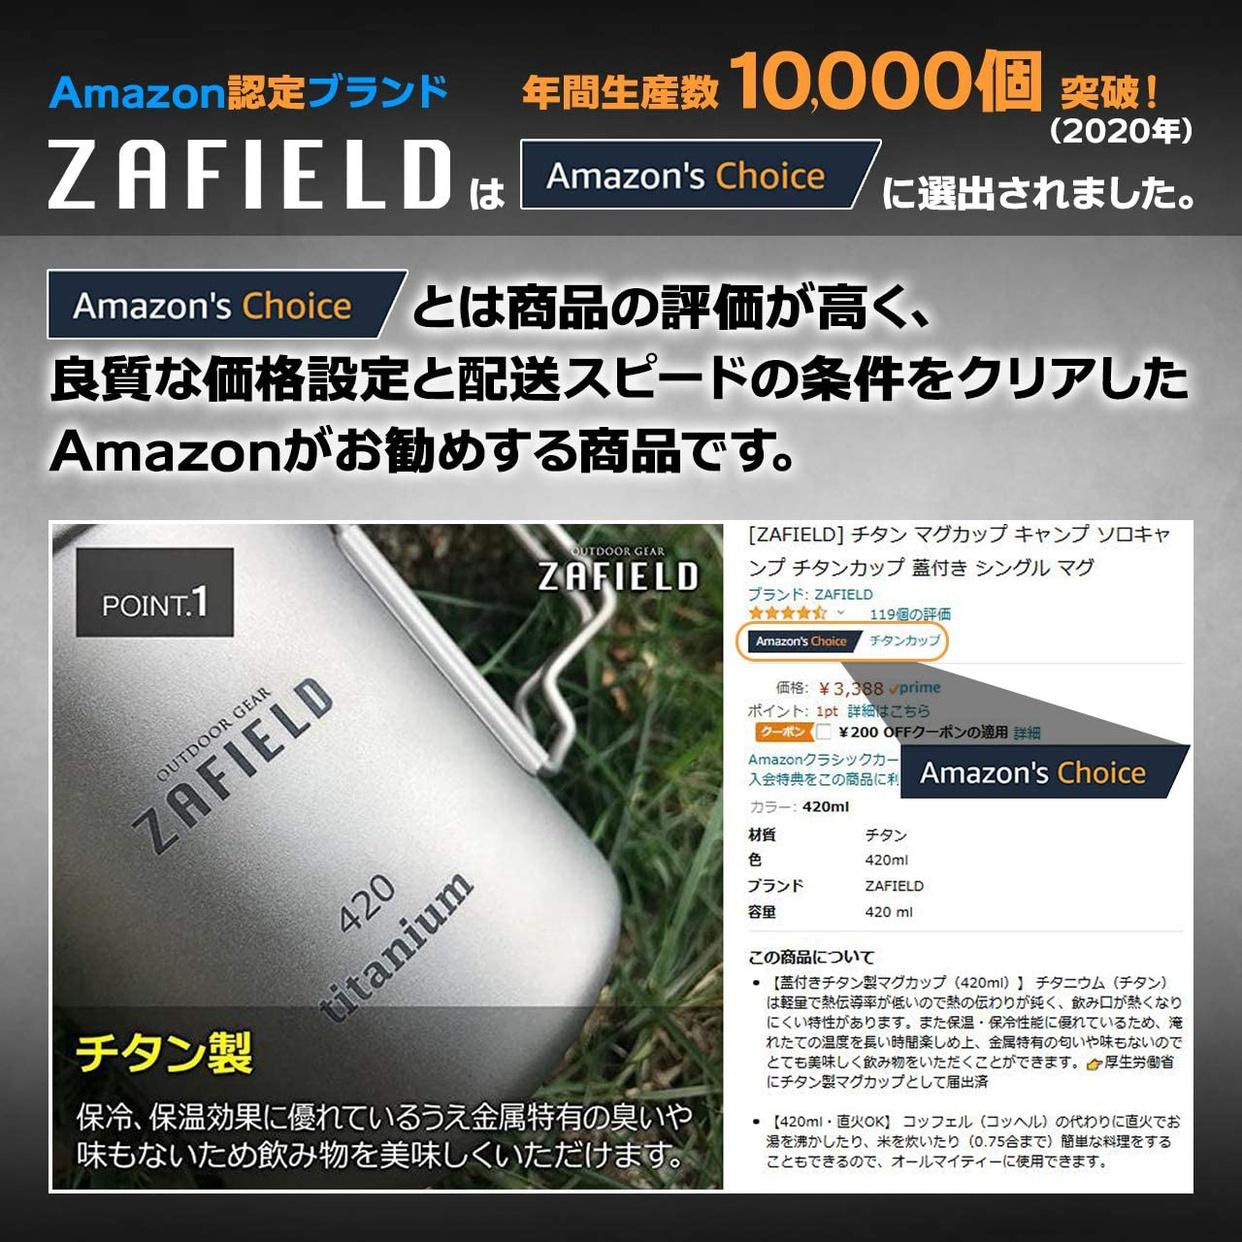 ZAFIELD(ザフィールド) チタンカップの商品画像2